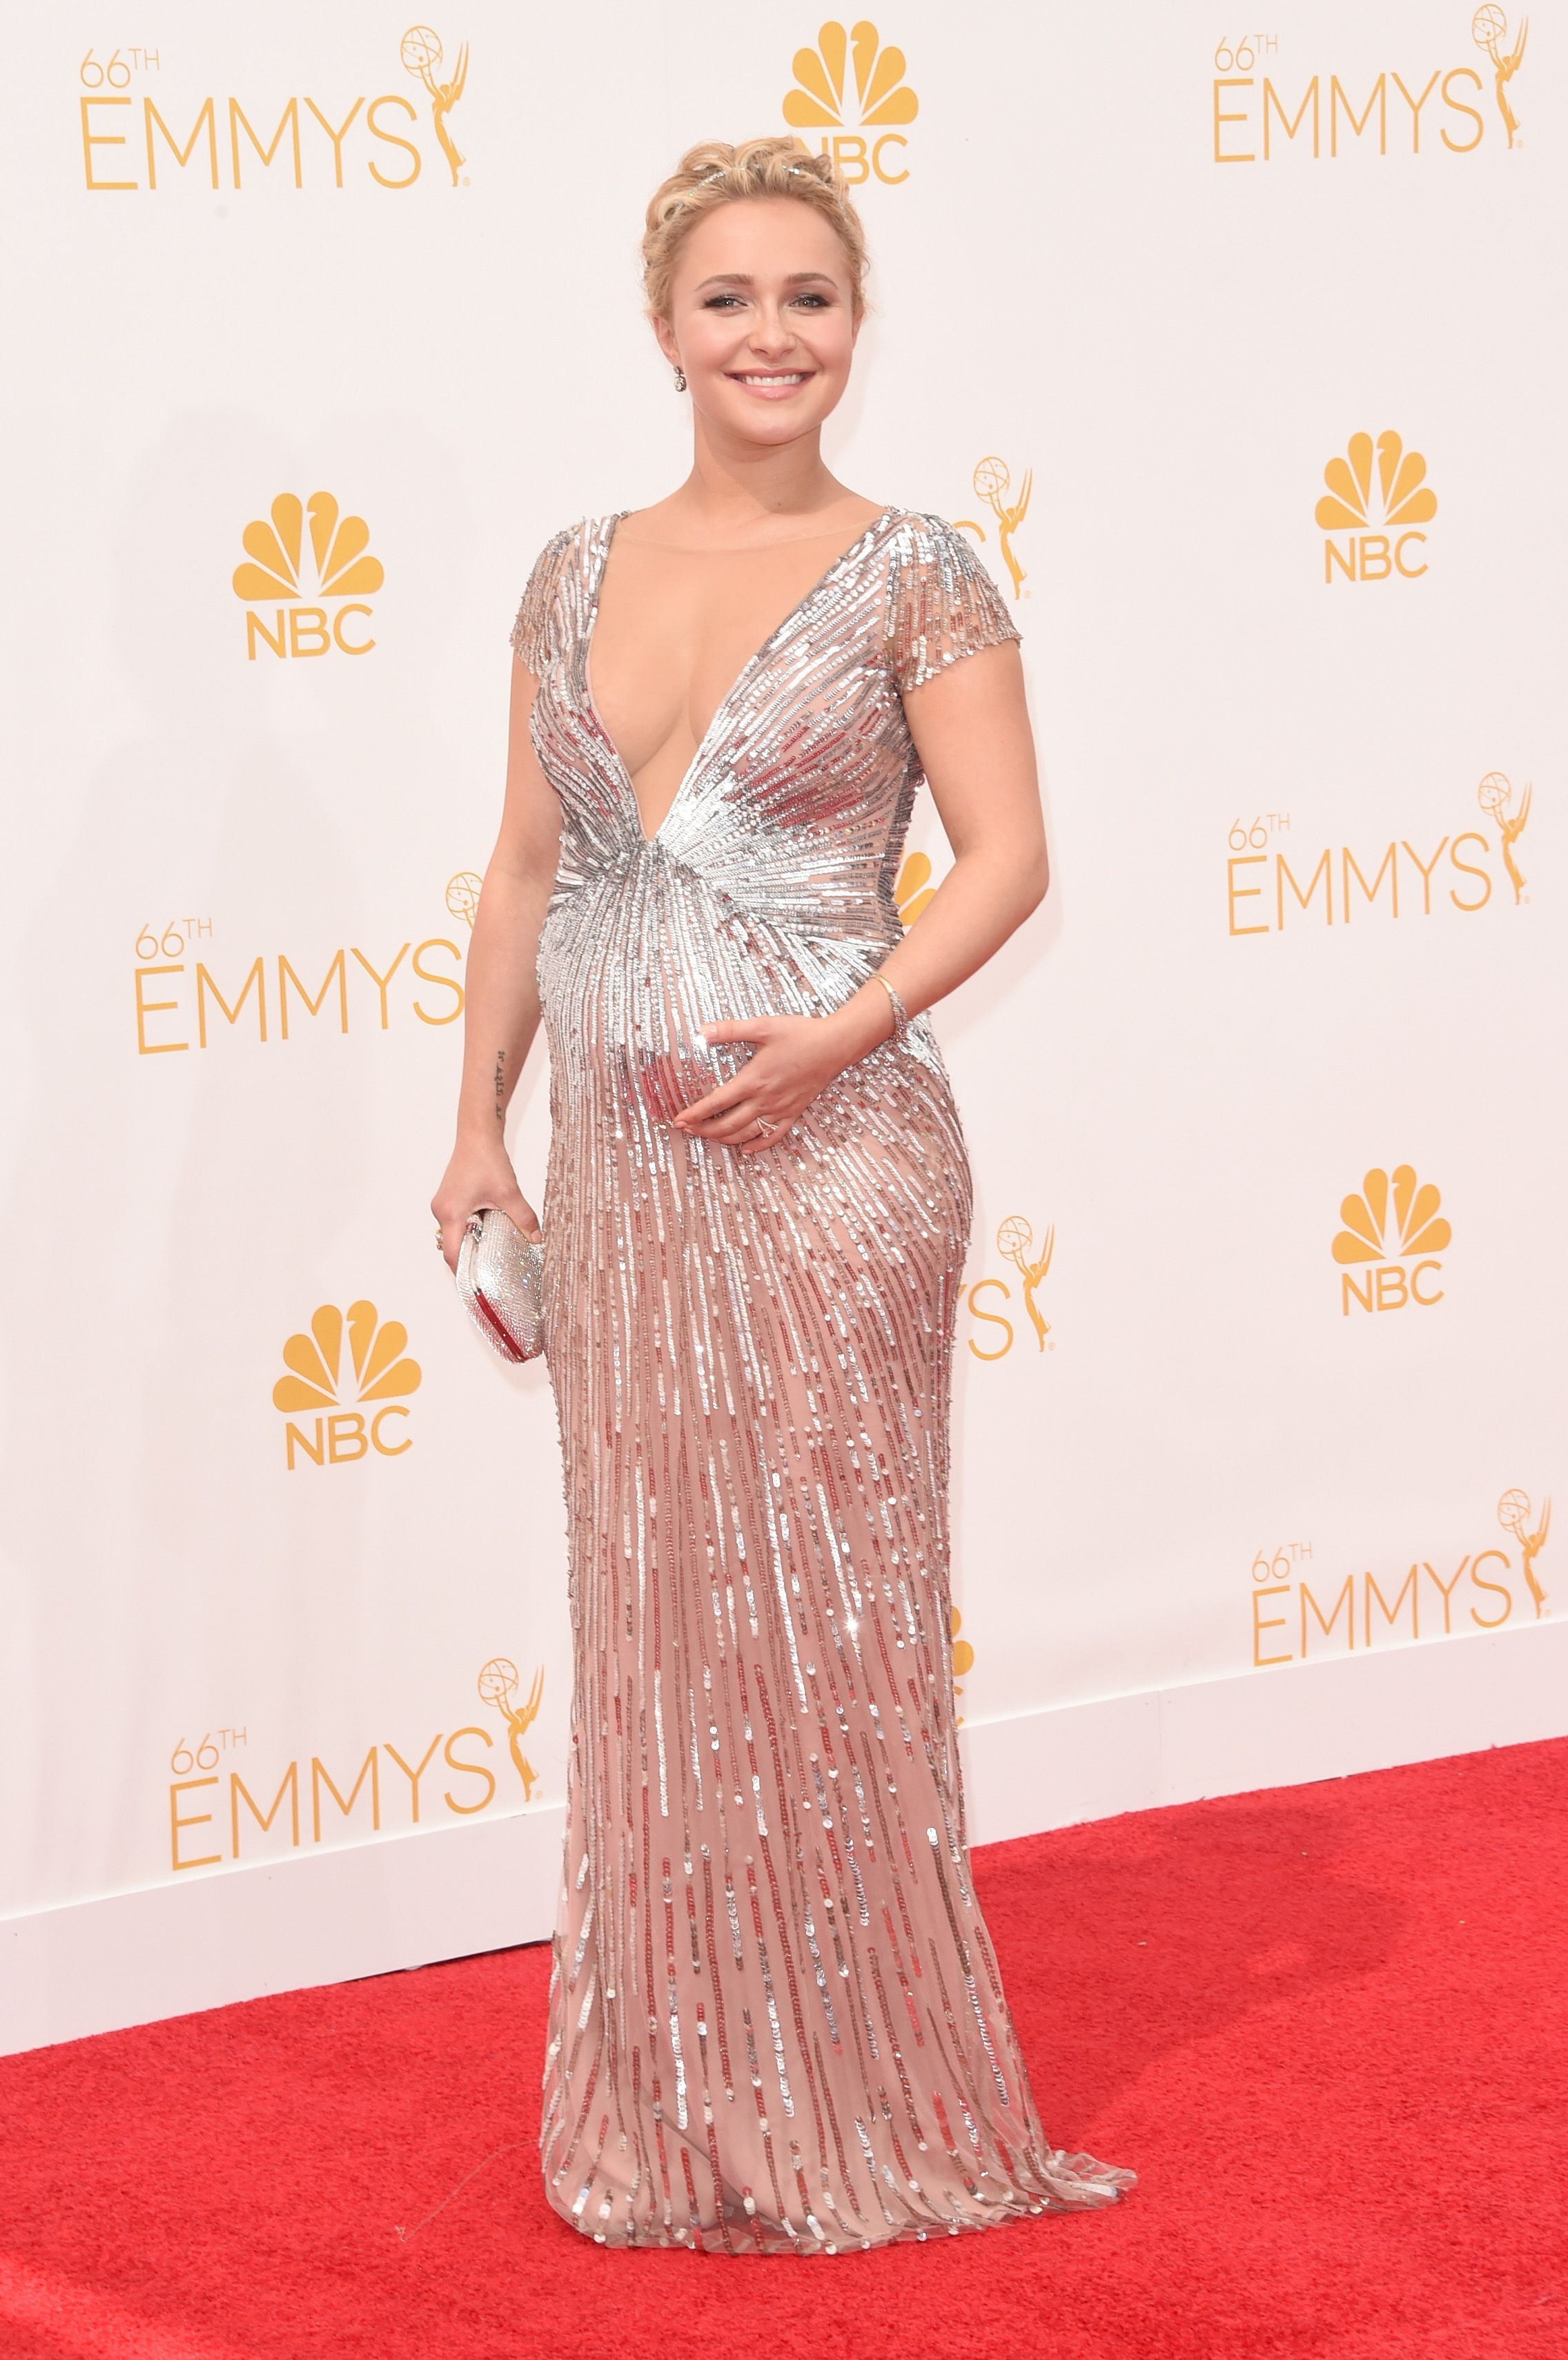 Emmy fashion 2014 best red carpet dresses blogher - Hayden Panettiere In A Lorena Sarbu Dress At The 2014 Primetime Emmy Awards Redcarpet